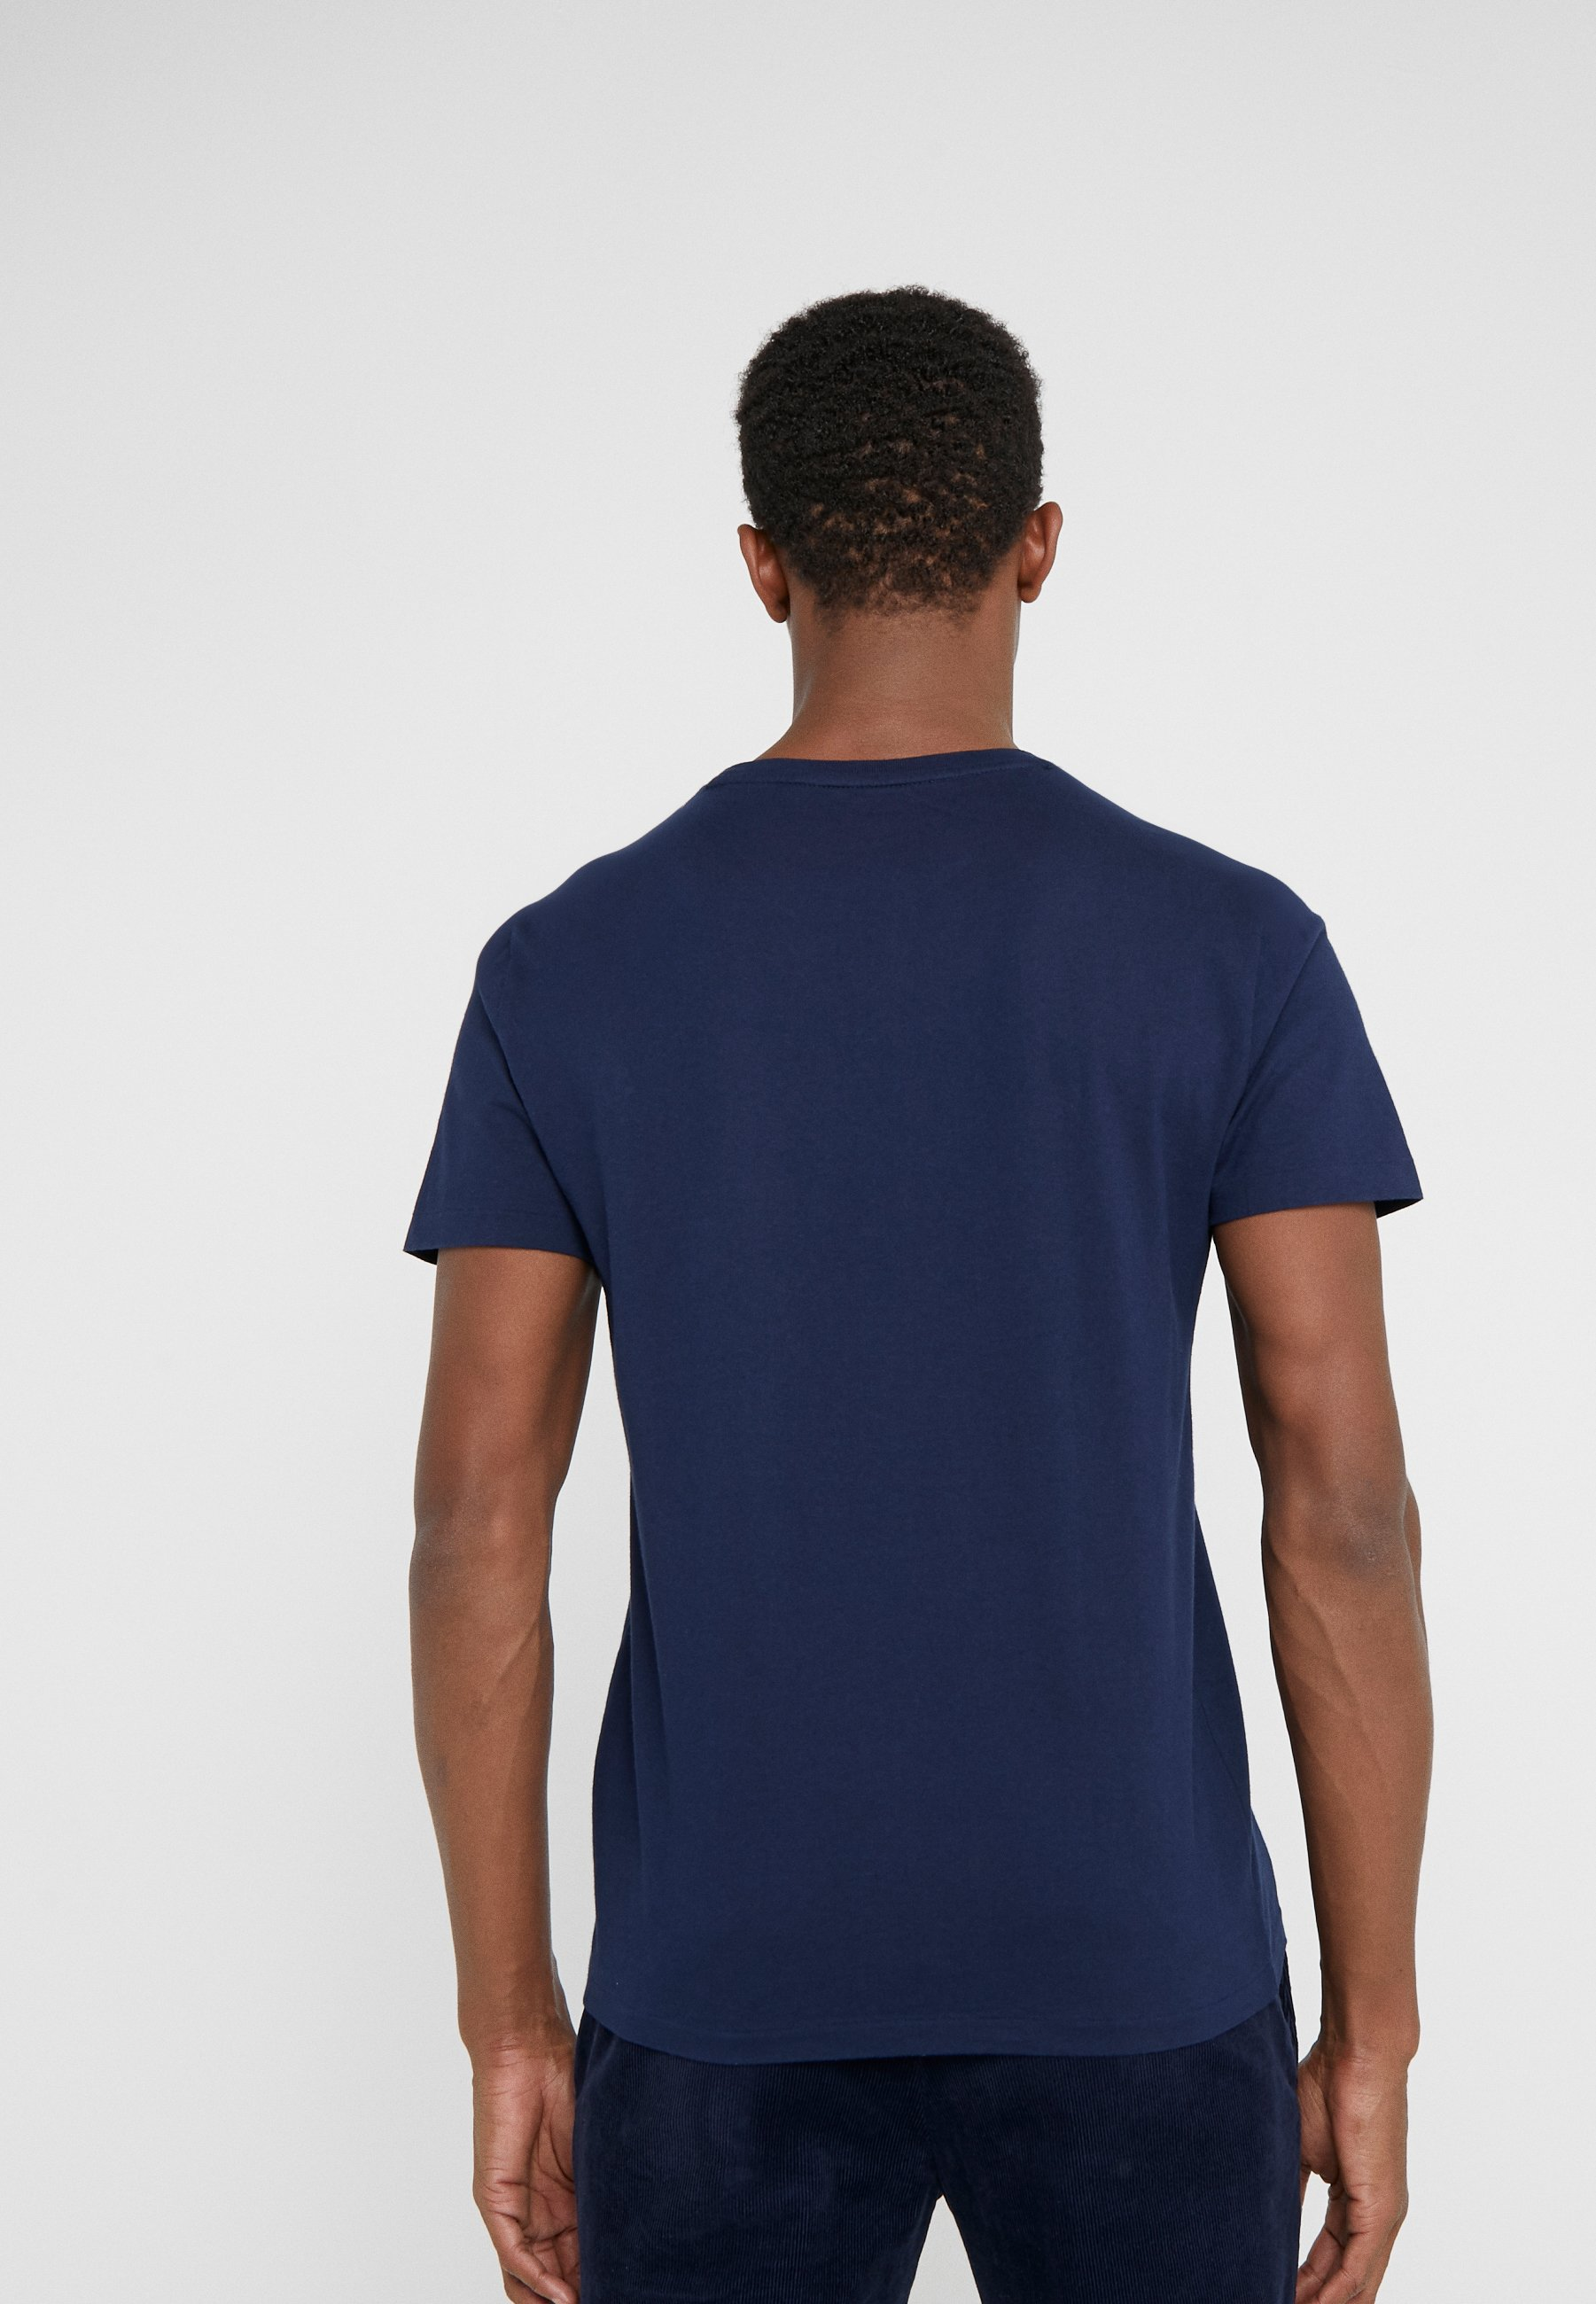 Polo Ralph Lauren Slim Fit - T-shirt Basic Cruise Navy Black Friday